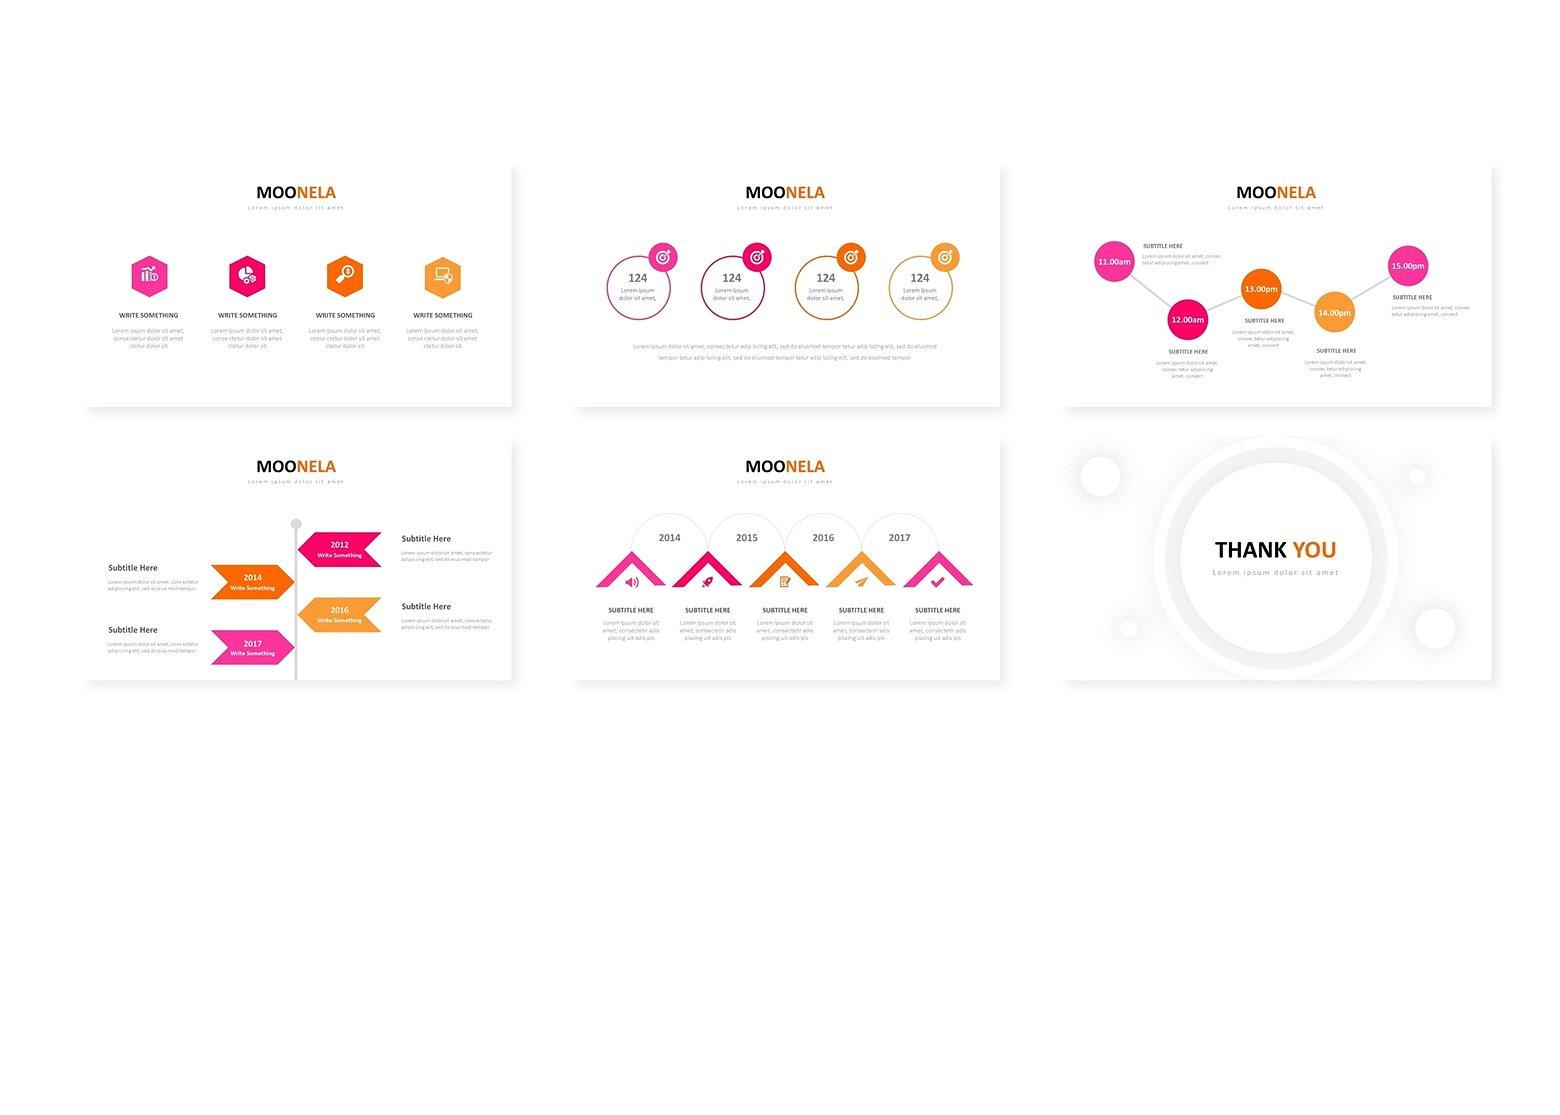 超巨量的红色企业介绍幻灯片模板 Super Huge Red Corporate Presentation Slide Template插图3